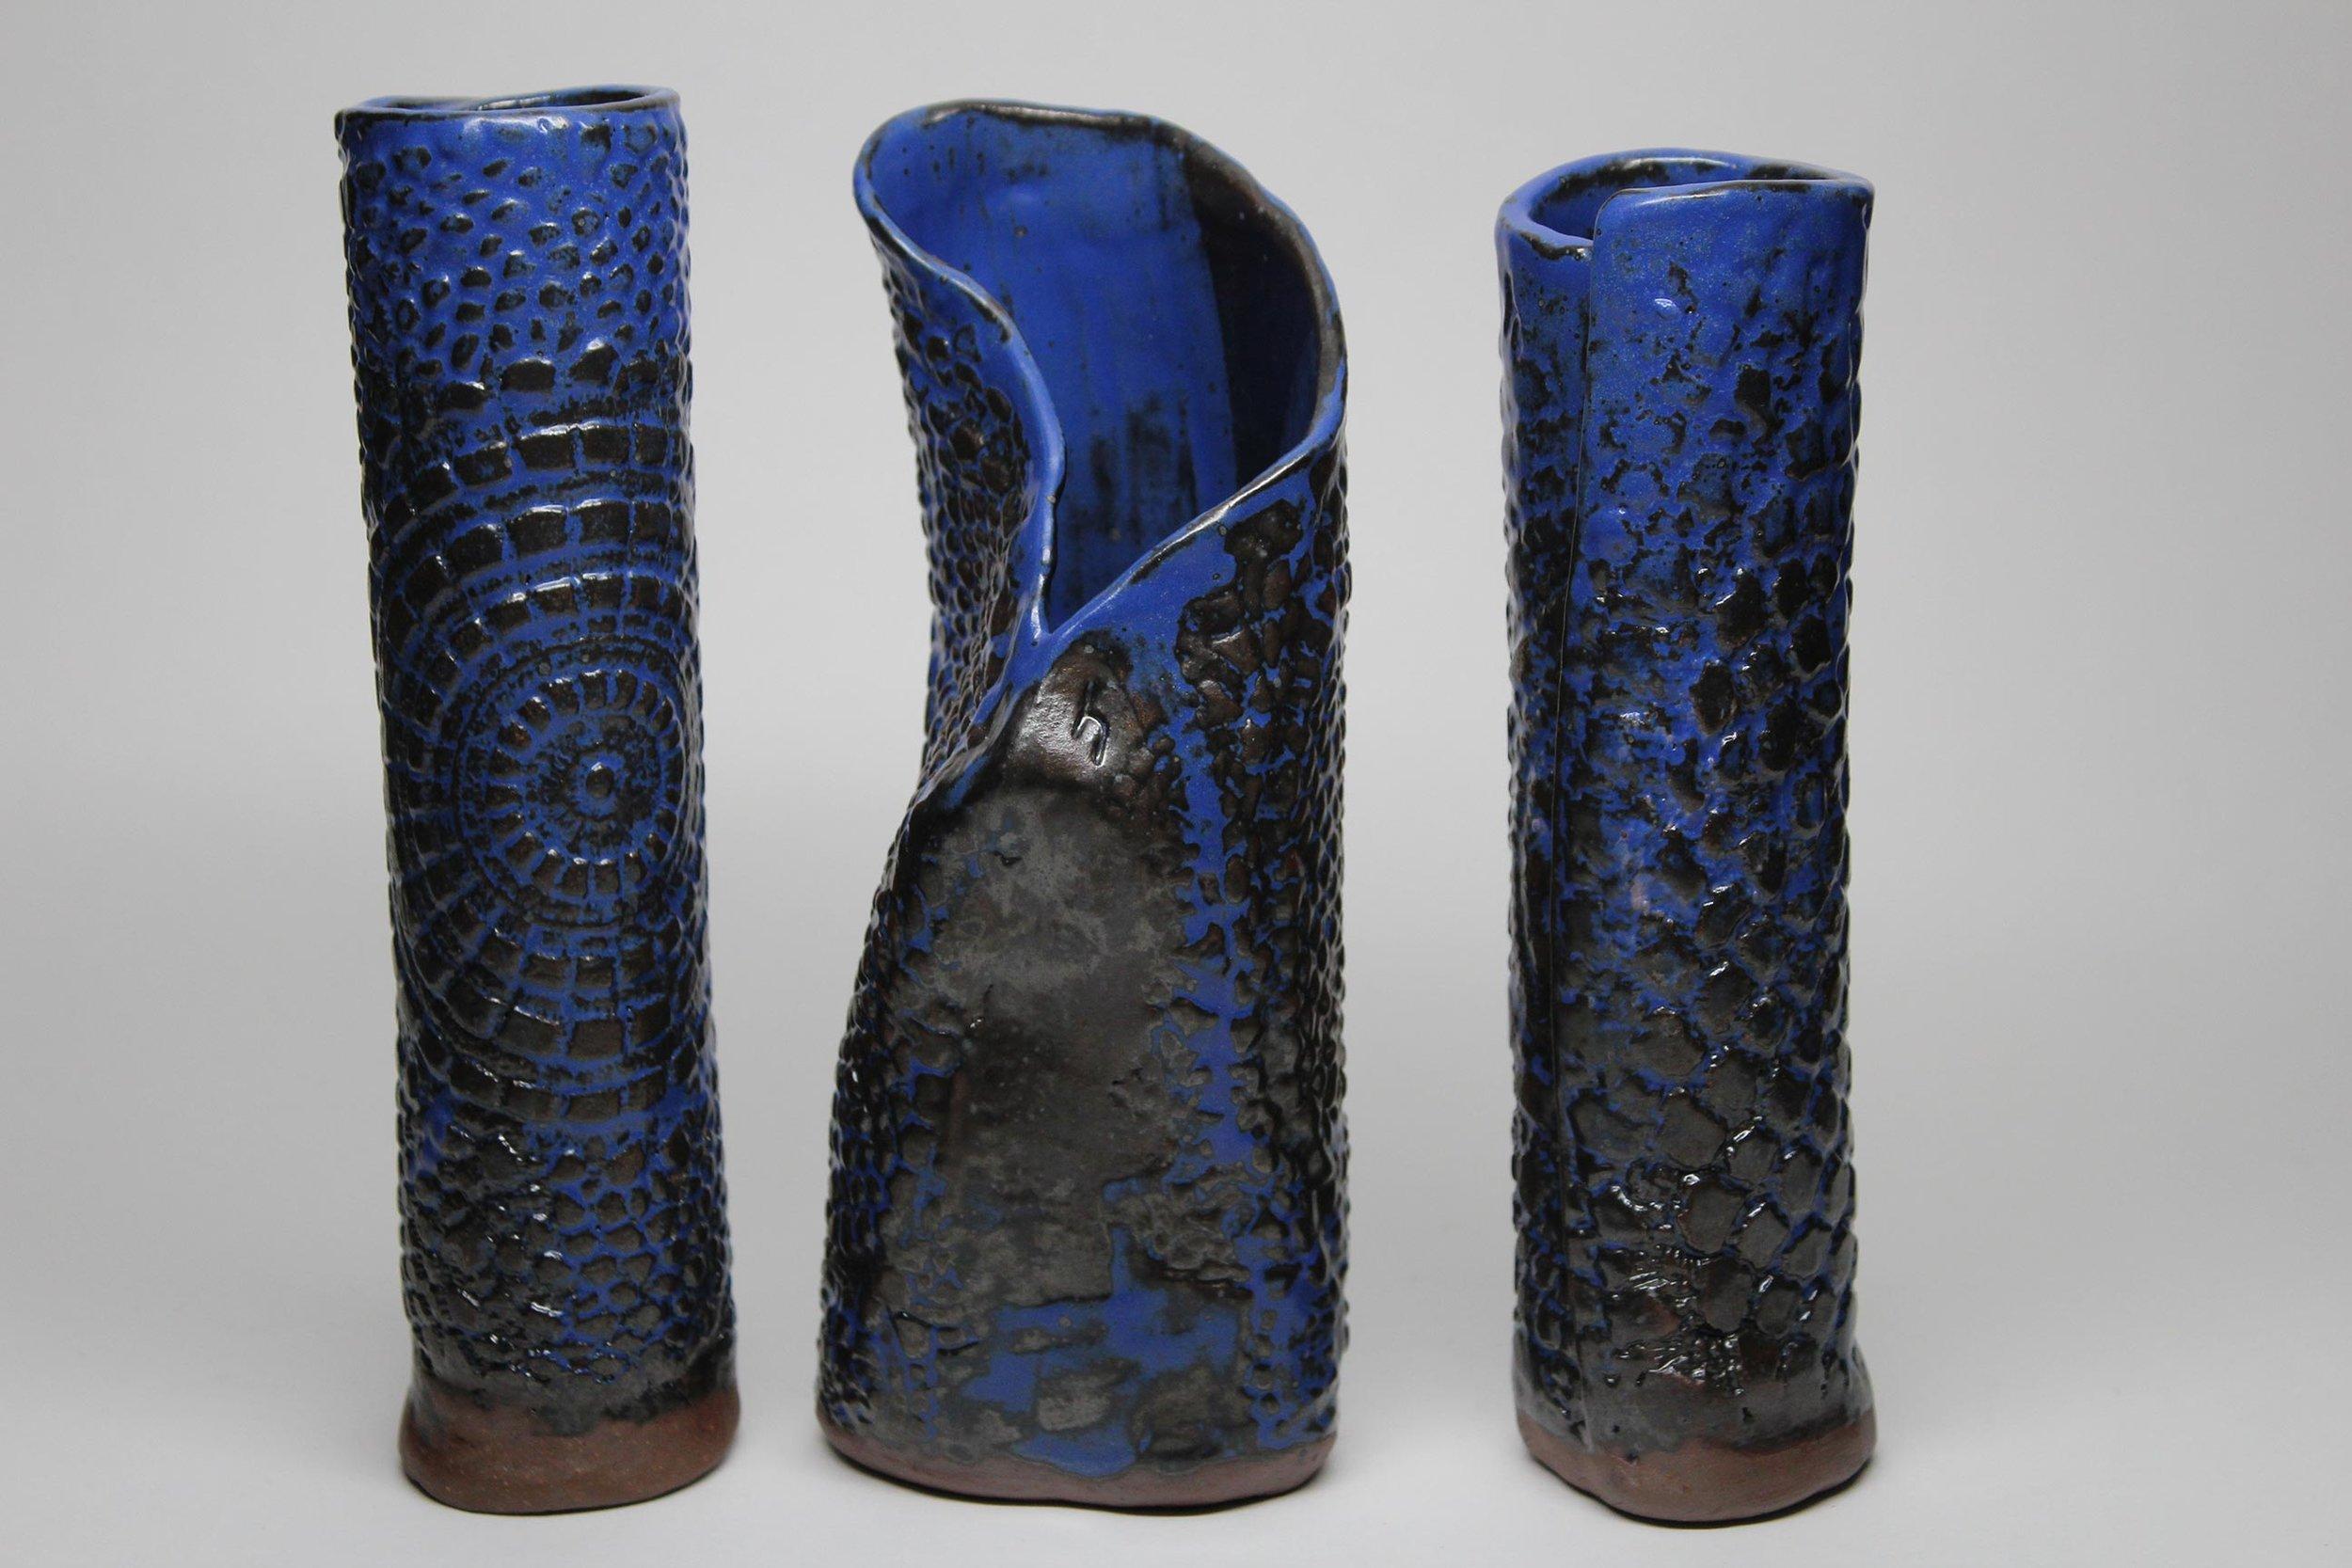 Horn_Vase Trio_Earthenware_9 inches tall.jpg